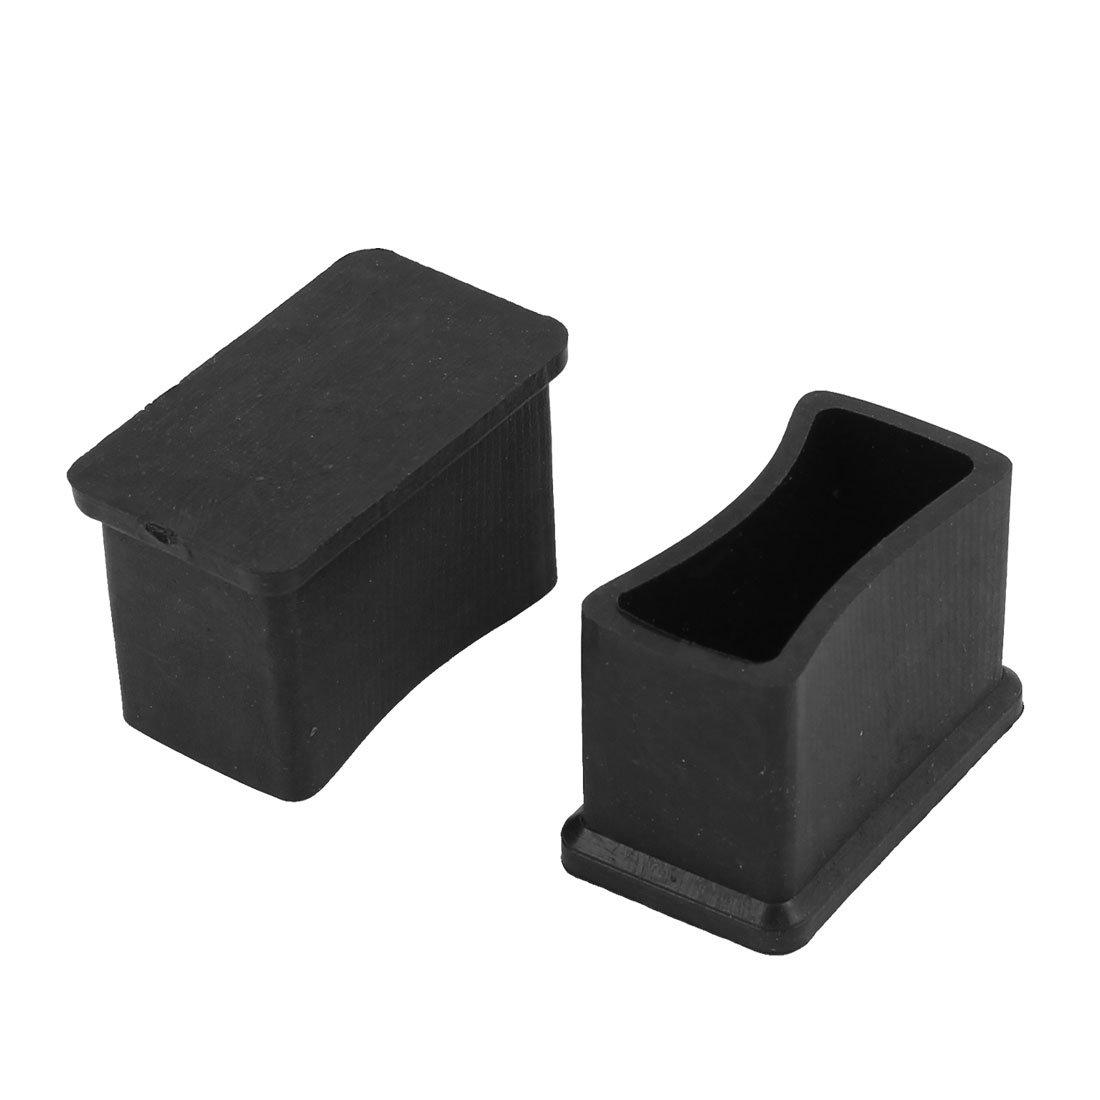 Amazon com  Rubber Rectangular Furniture Foot Cover Protector 30mm x 15mm 2  Pcs  Kitchen   DiningAmazon com  Rubber Rectangular Furniture Foot Cover Protector 30mm  . Rubber Chair Foot Covers. Home Design Ideas